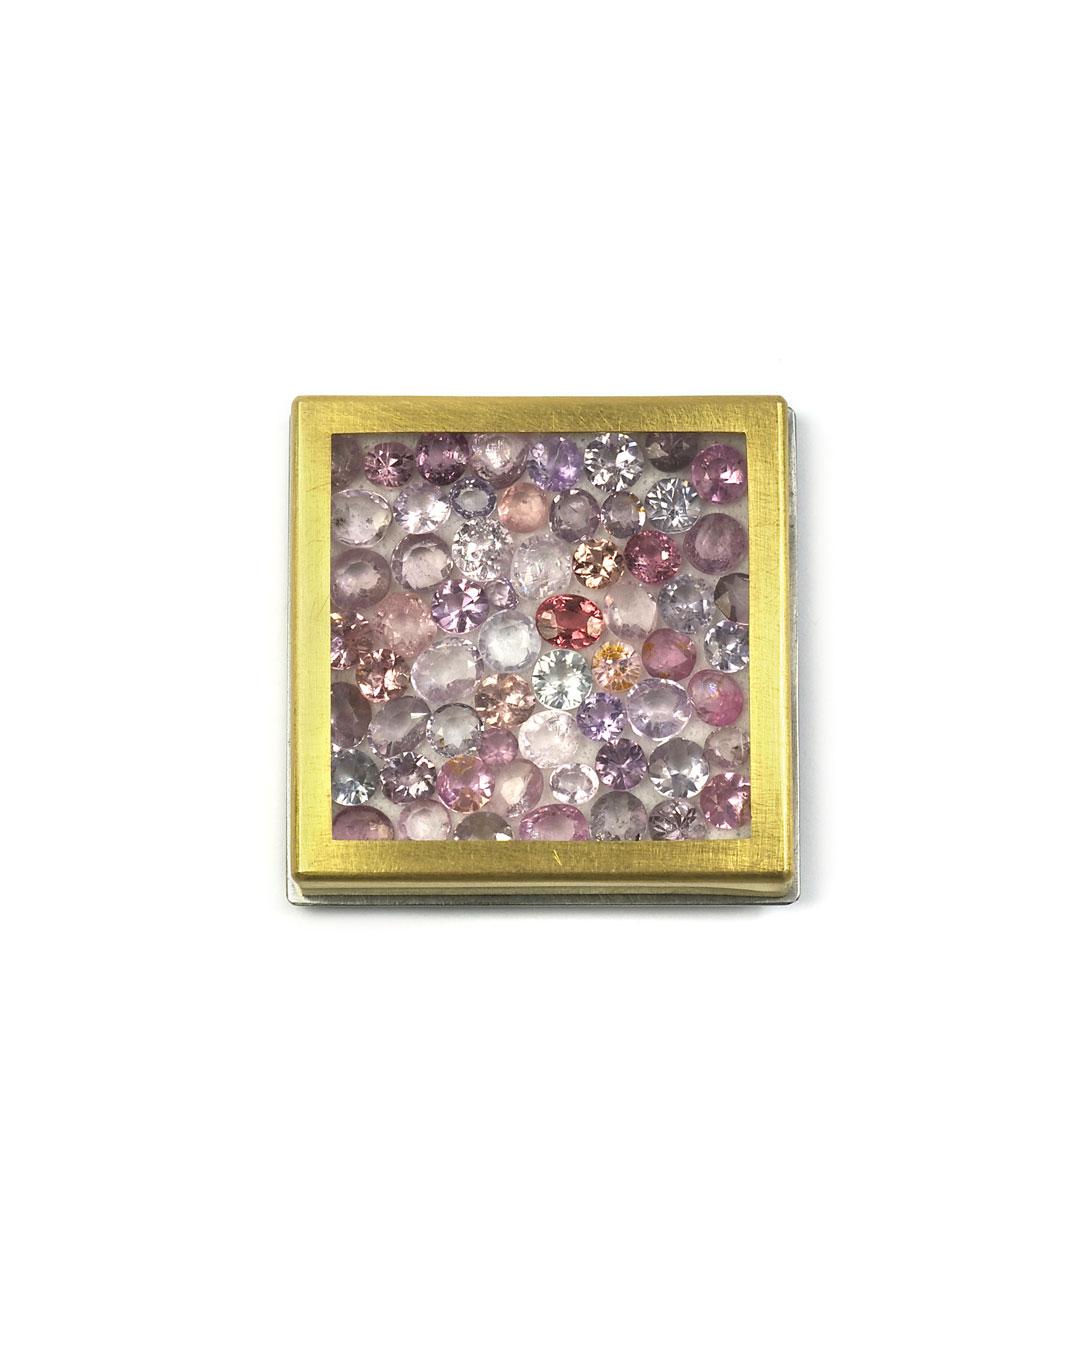 Etsuko Sonobe, untitled, 2009, brooch; 20ct gold, agate, 38 x 38 x 7 mm, €3500